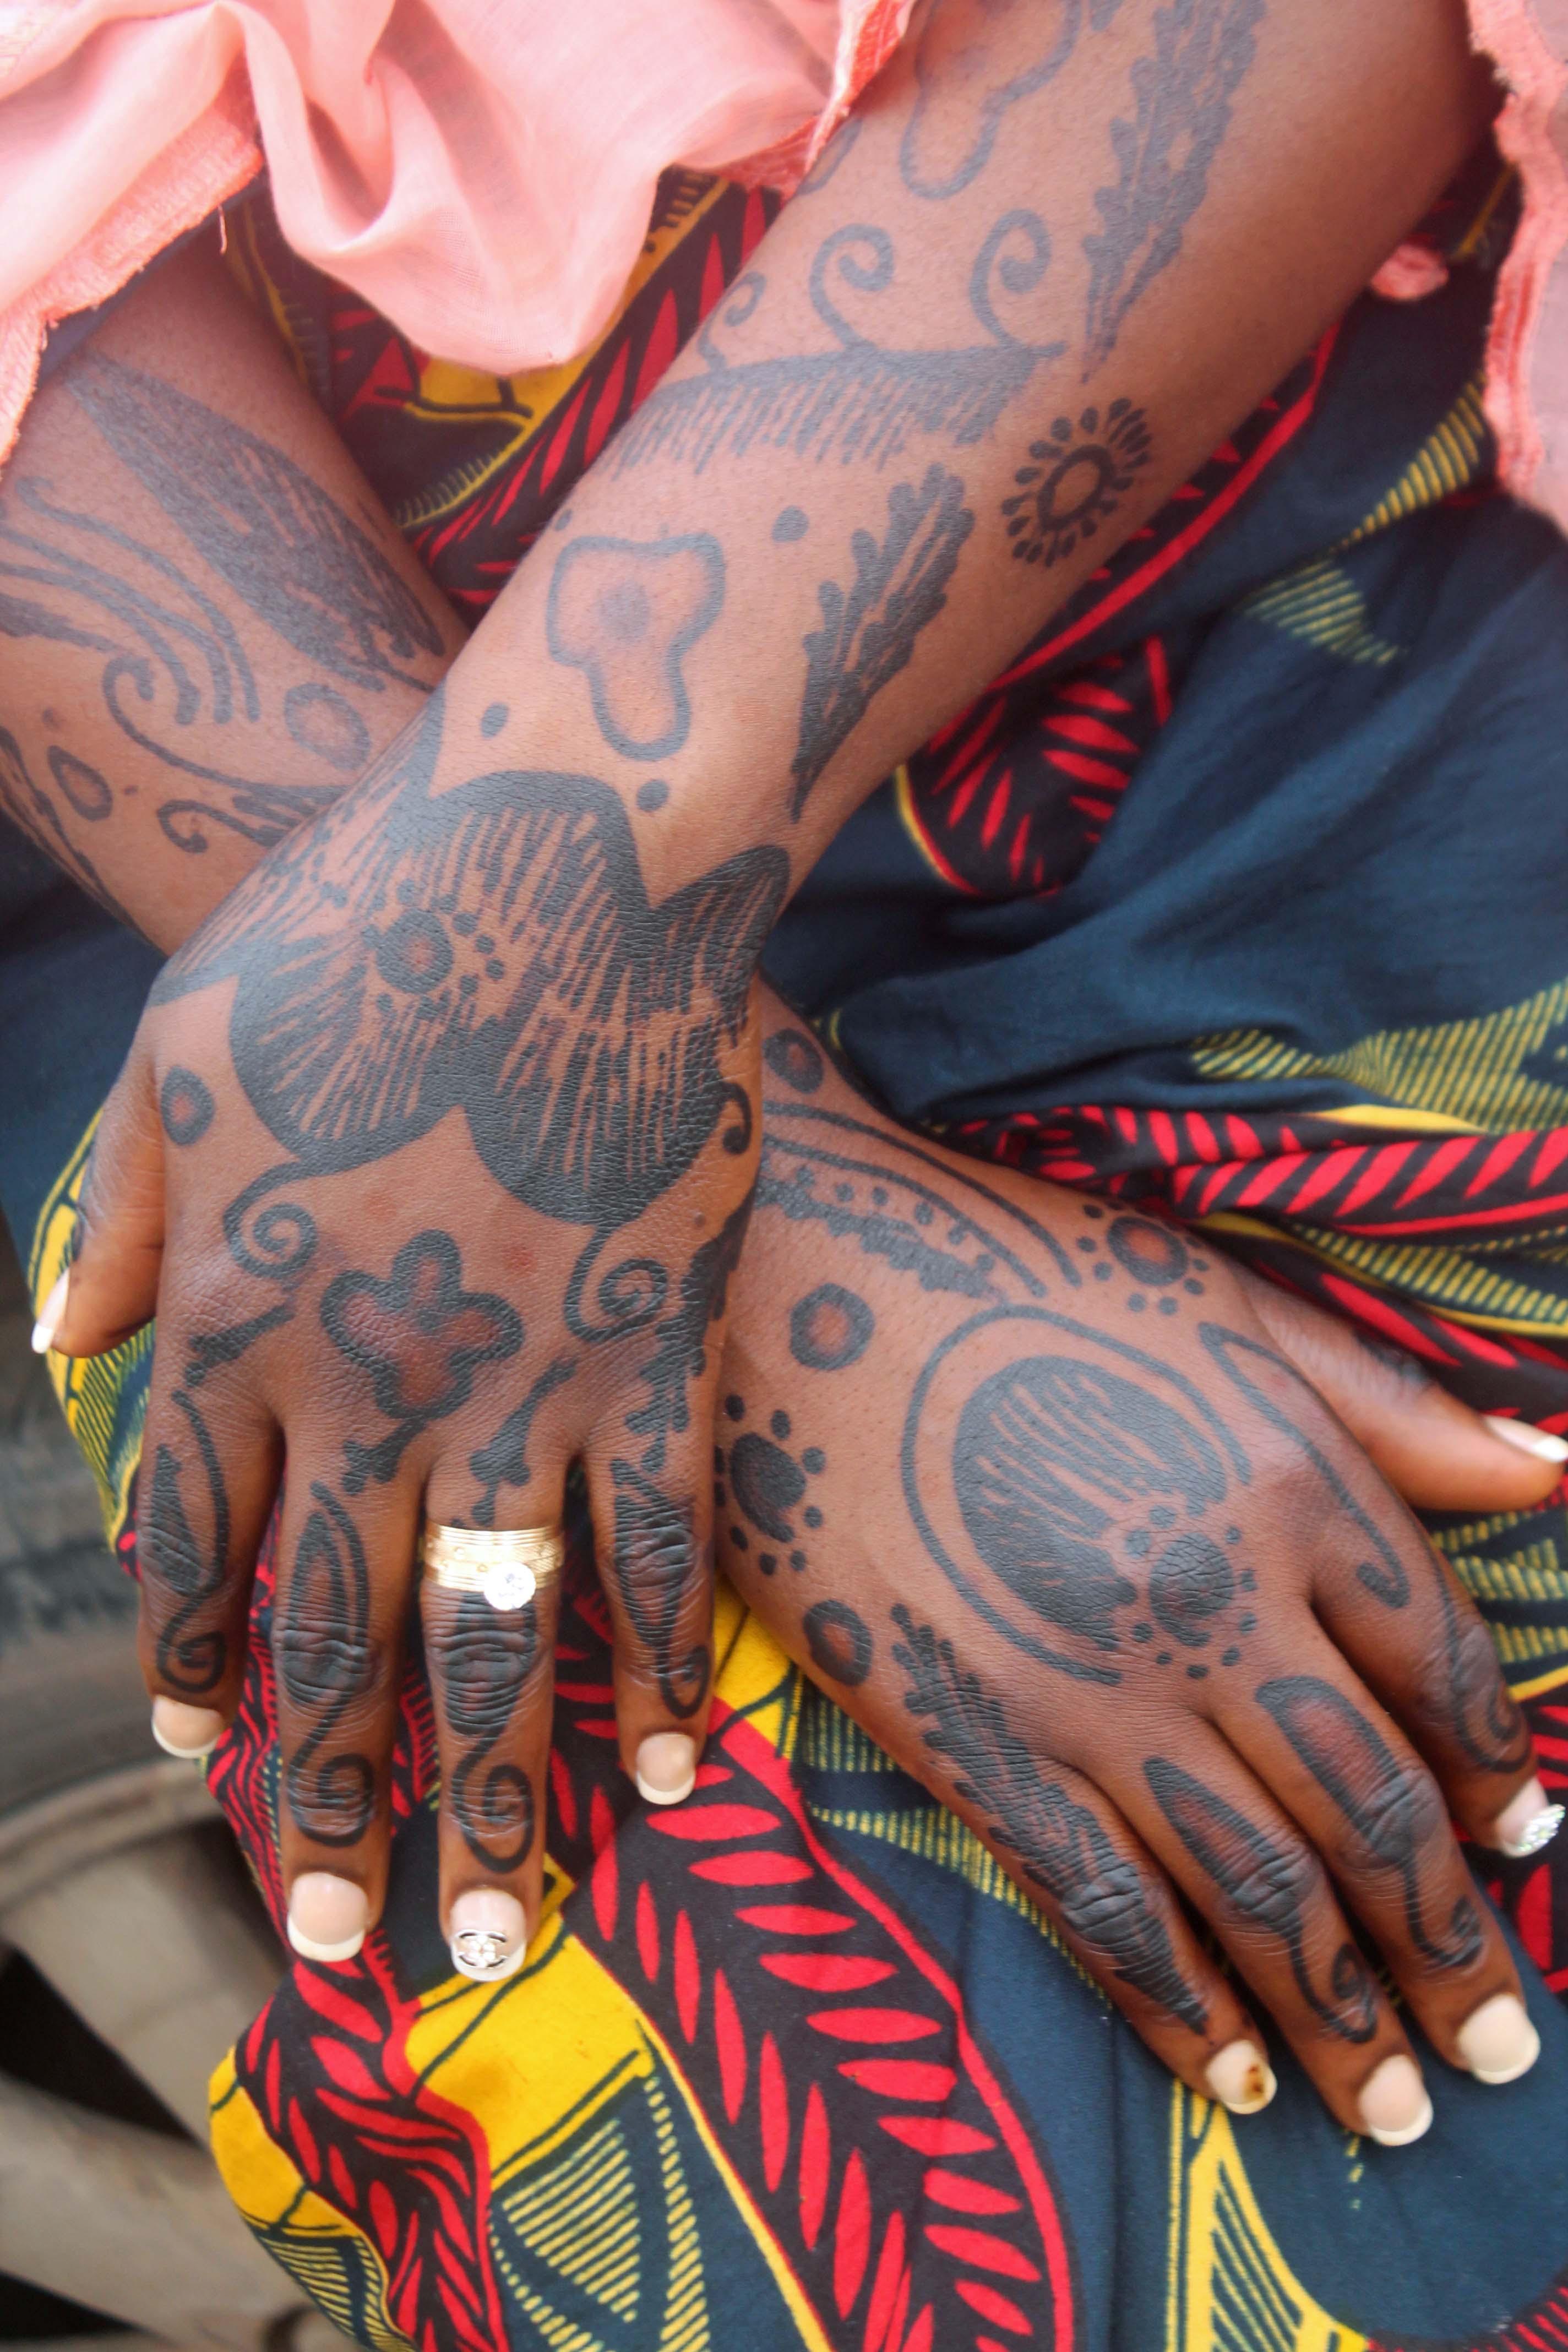 yoruba traditional tattoos ogbomosho oyo state nigeria jujufilms juju films. Black Bedroom Furniture Sets. Home Design Ideas